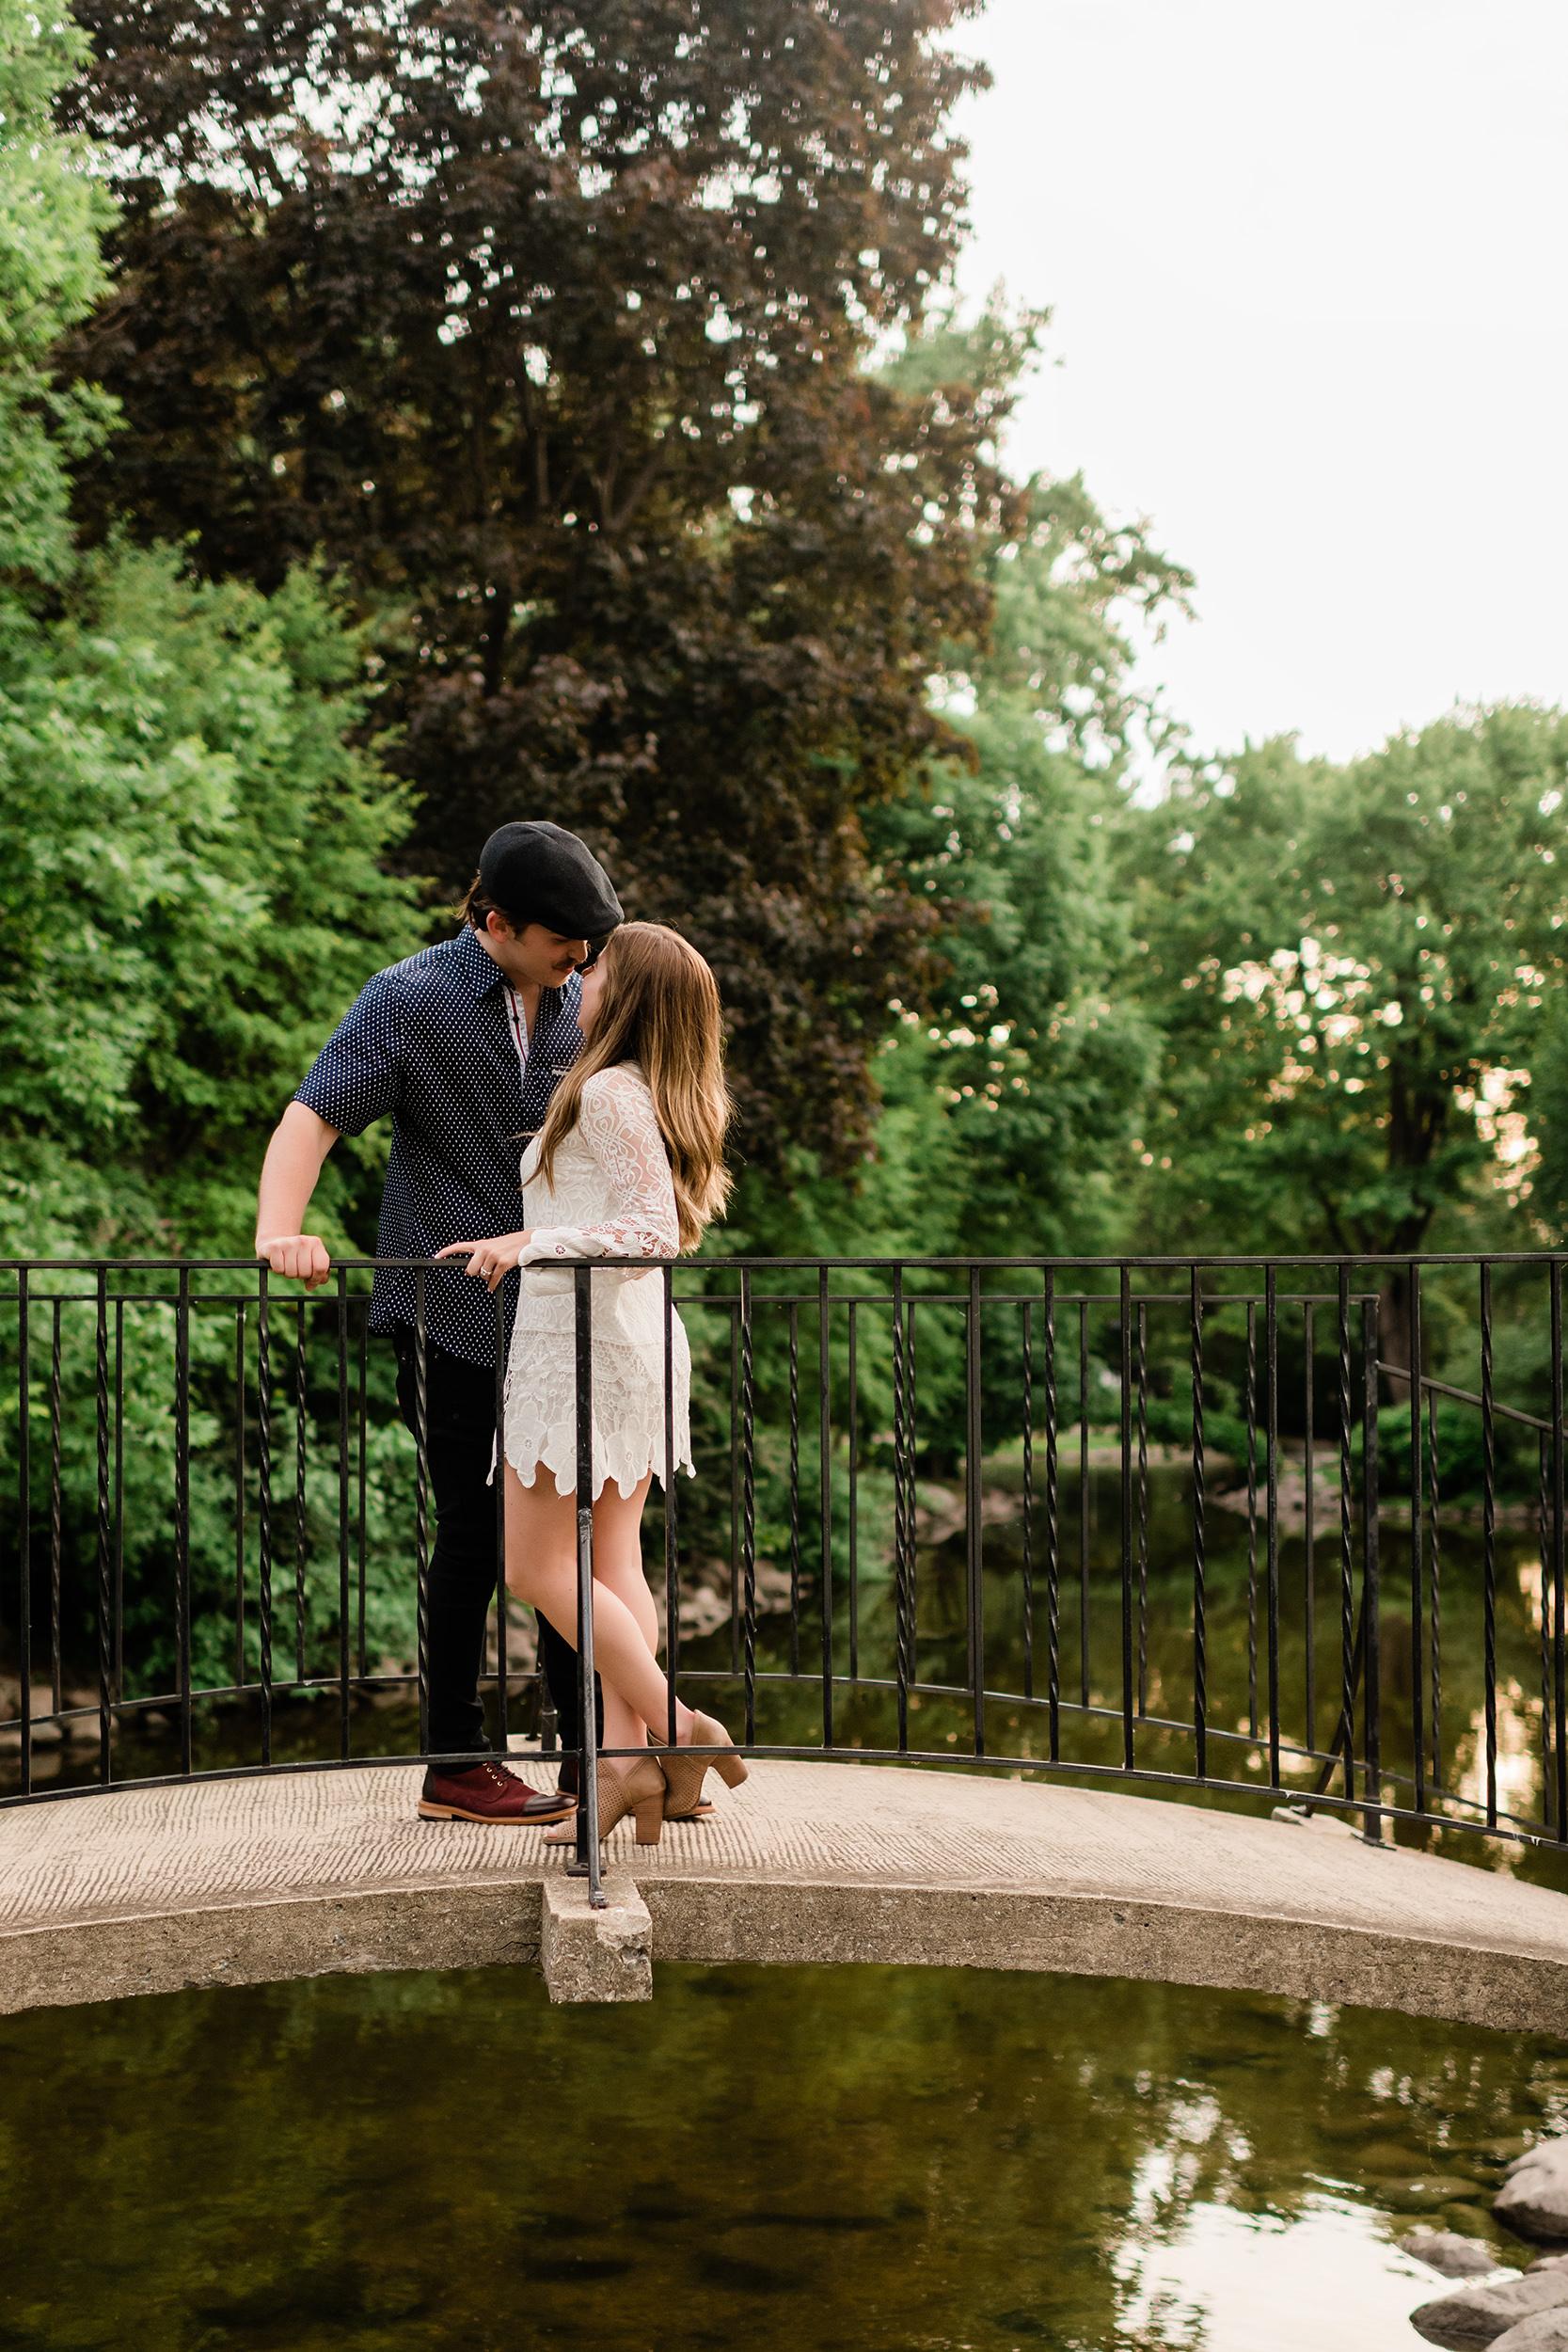 Engaged couple kissing on a bridge